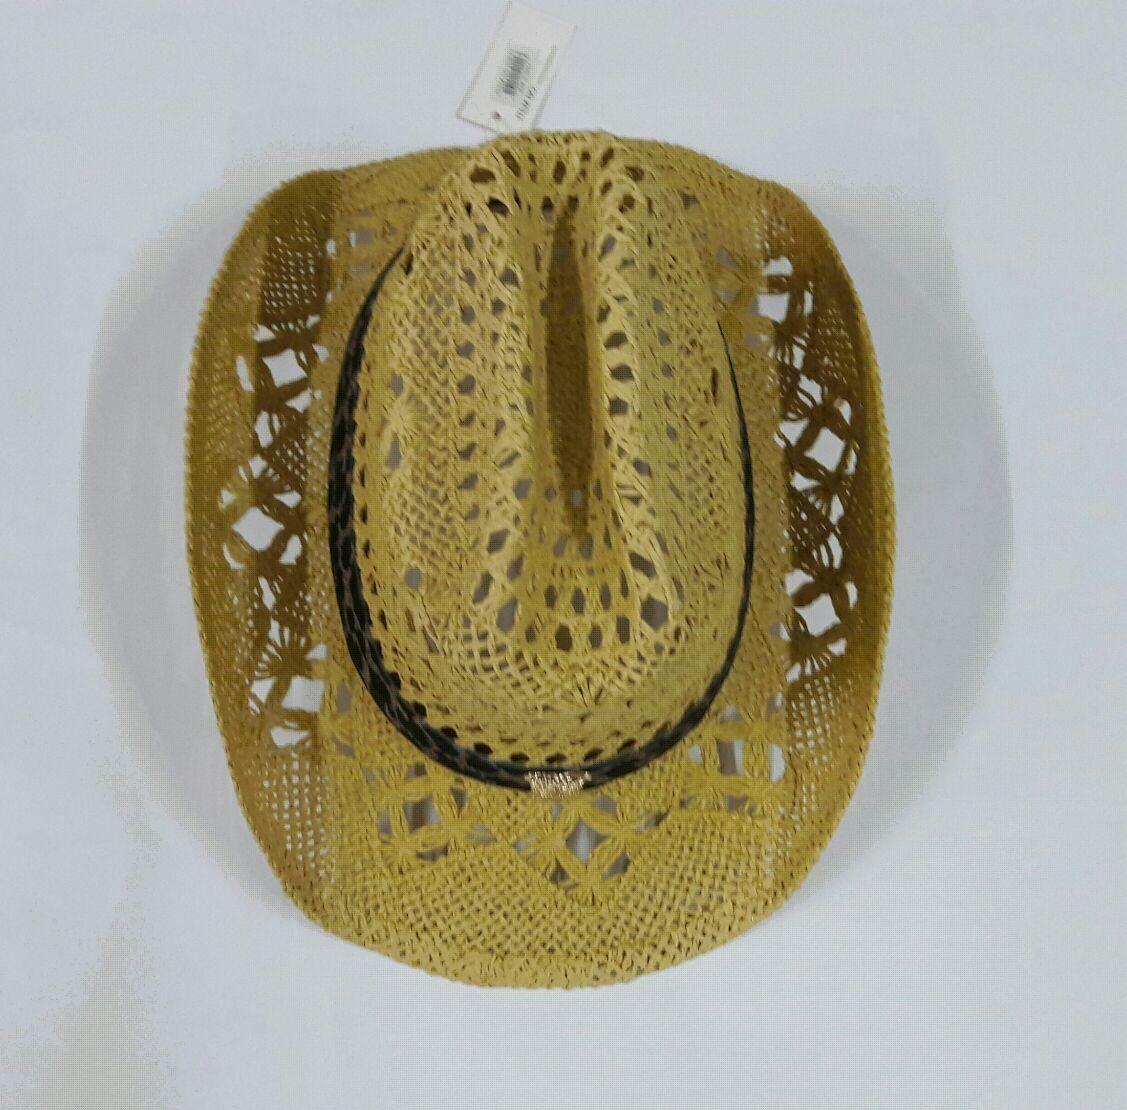 66bdd8394d2b7 kit 10 chapéu cowboy tipo palha barreto atacado revendedor. Carregando zoom.